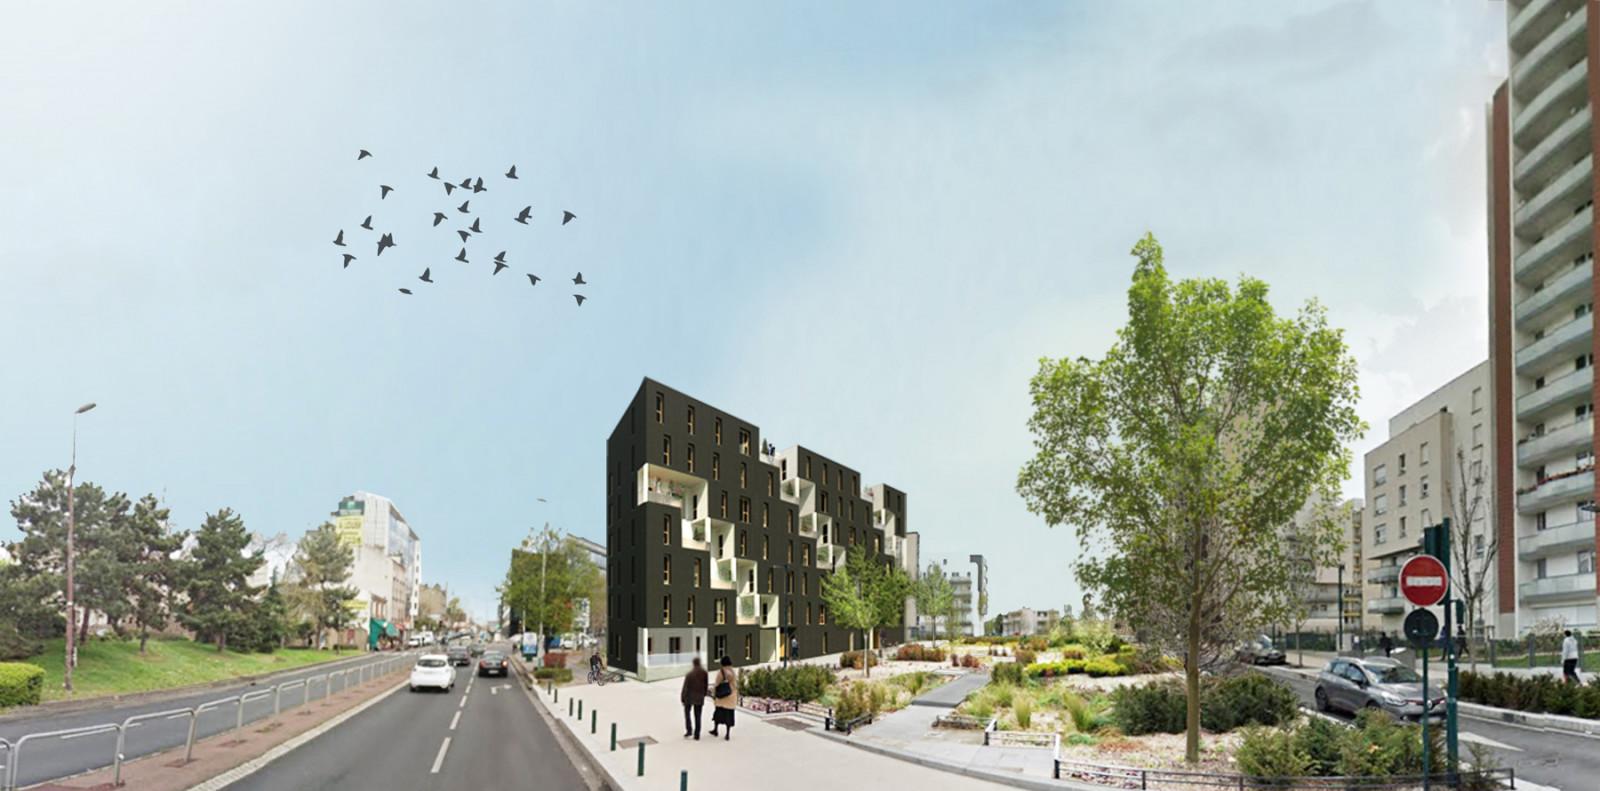 graam-gresillons-01-logements-gennevilliers-rue-entree-ville